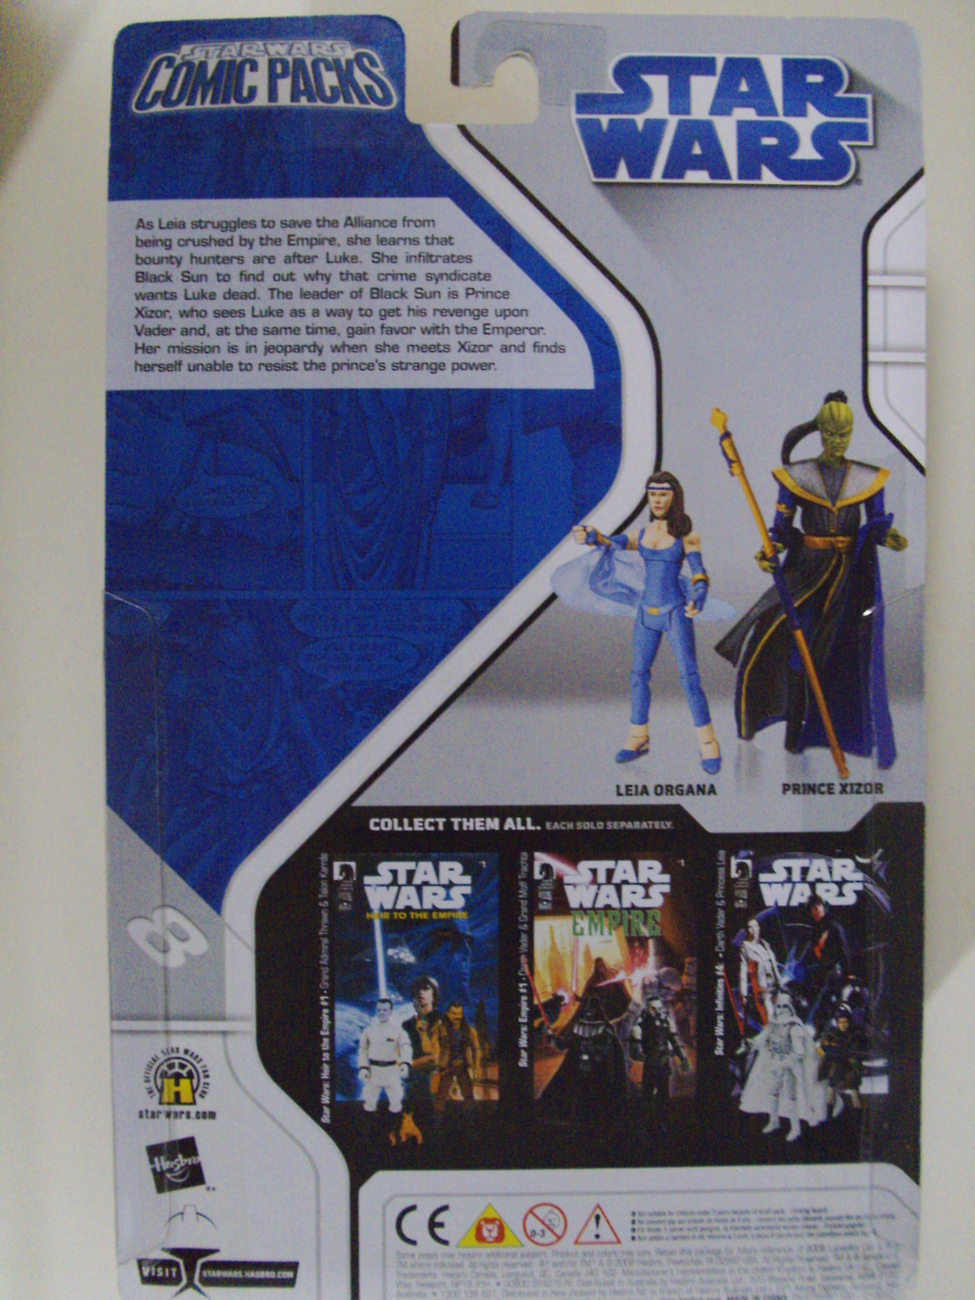 Star Wars Shadows of the Empire Leia Organa & Prince Xizor Comic Packs #4 - New